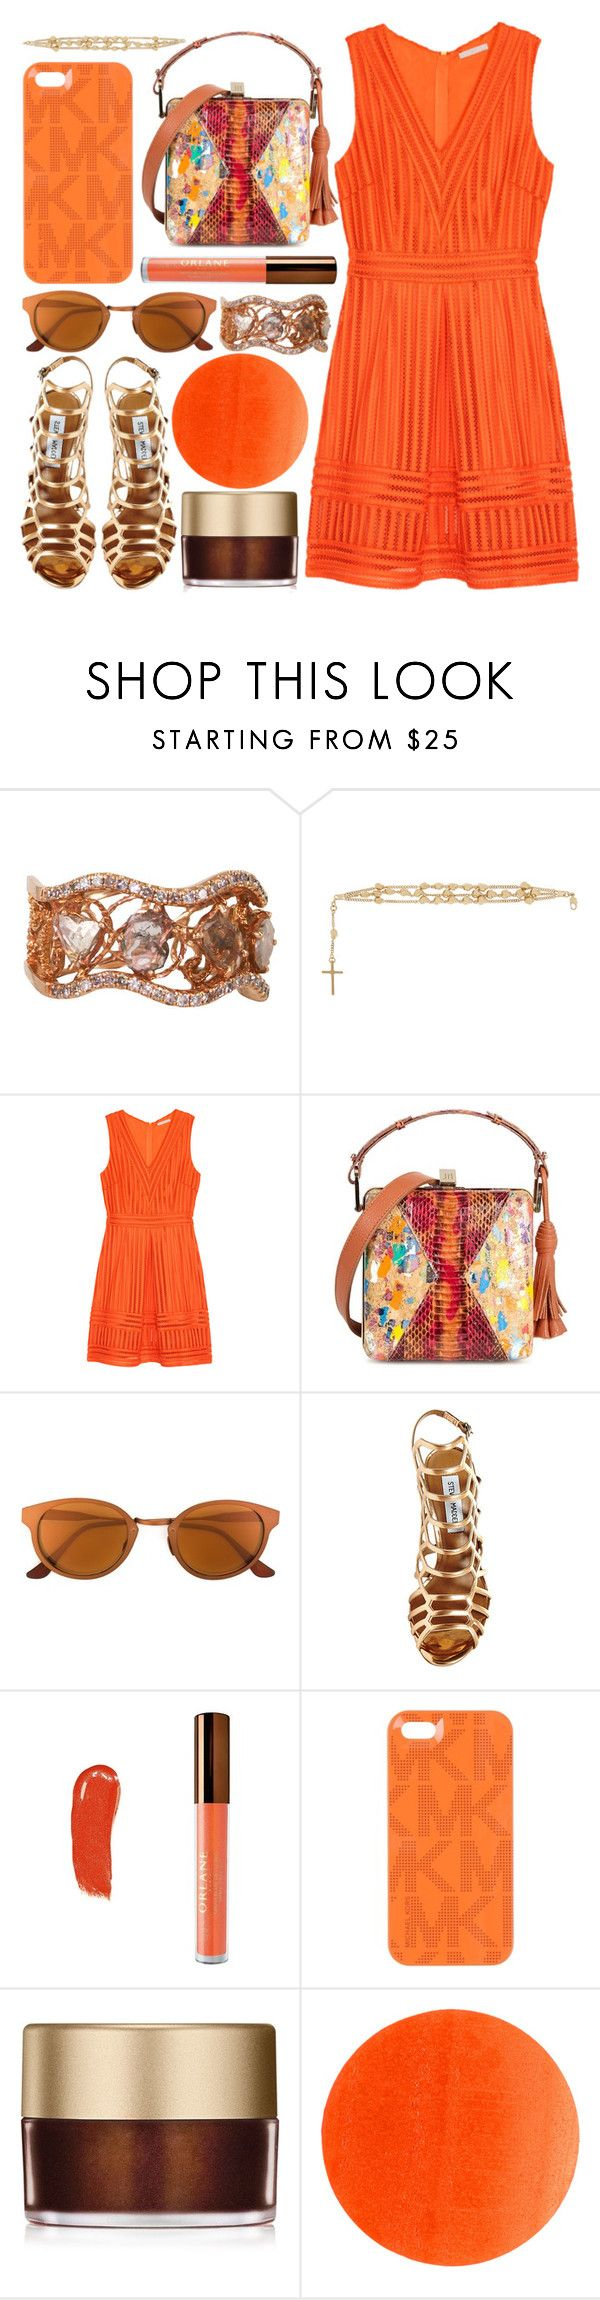 """sweet orange juice"" by foundlostme ❤ liked on Polyvore featuring L'Dezen, Givenchy, H&M, Jill Haber, RetroSuperFuture, Steve Madden, Orlane, Michael Kors, Stila and Illamasqua"